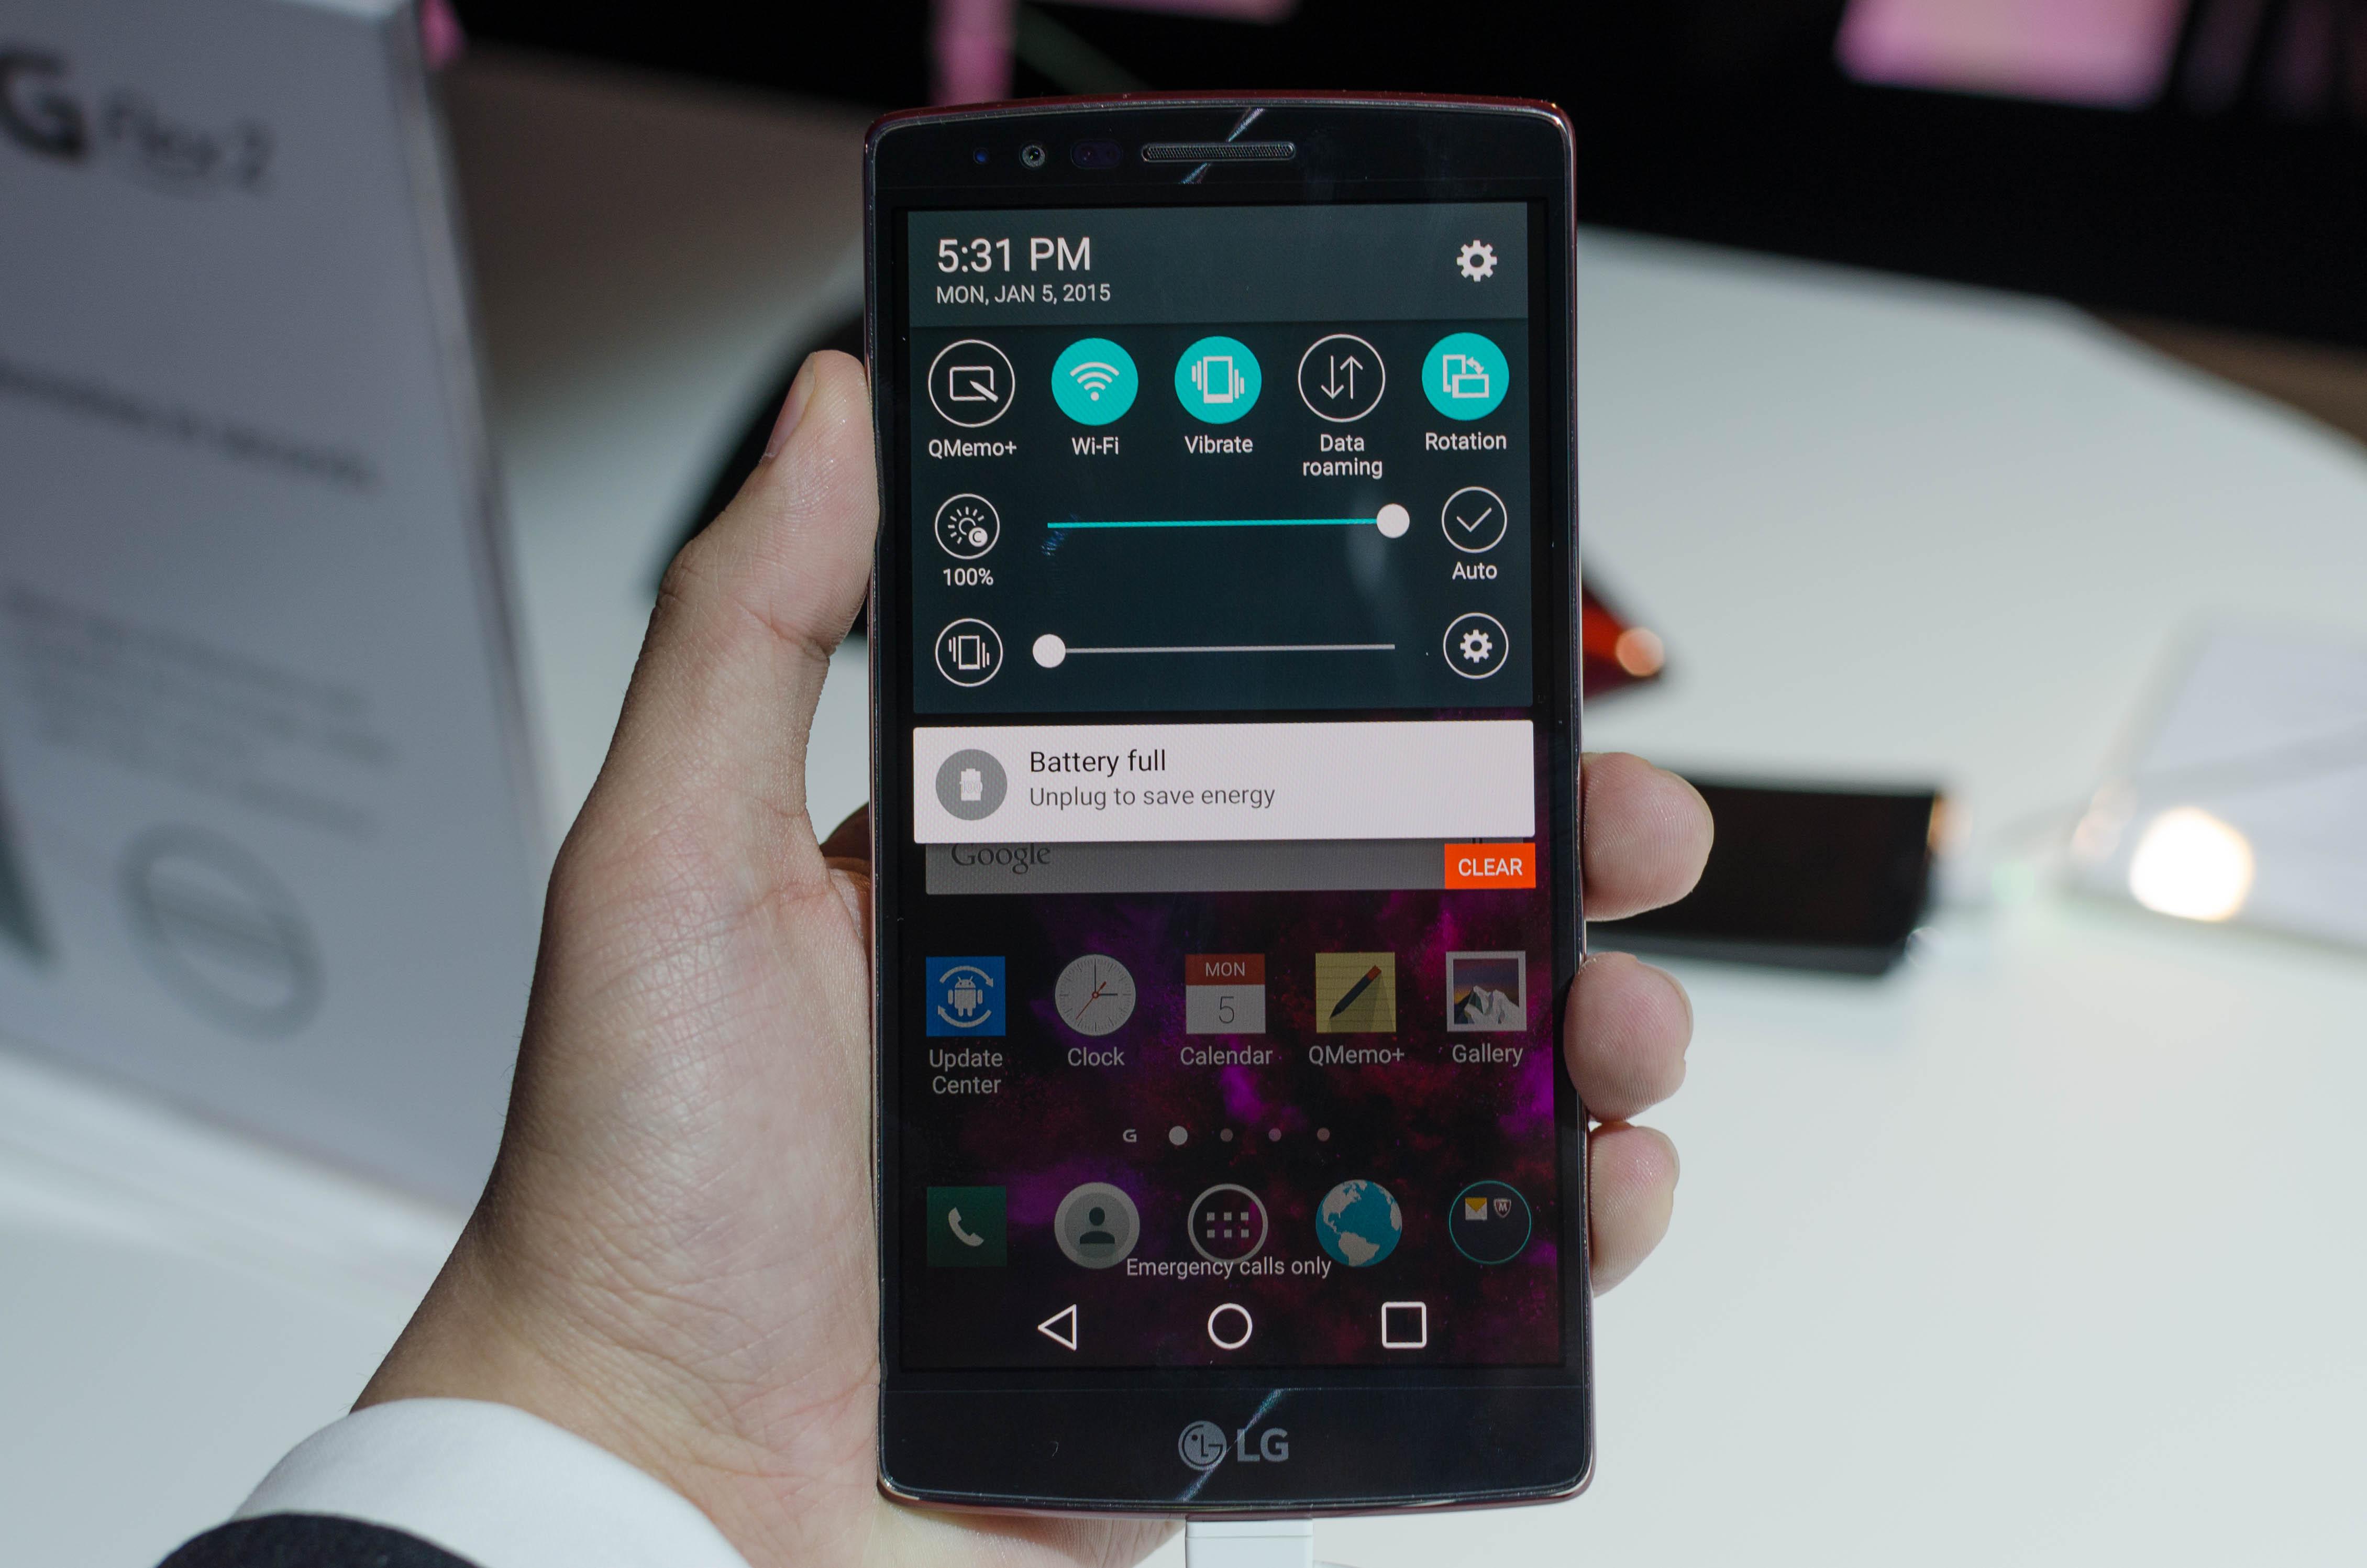 LG G Flex 2: Hands-on Impressions